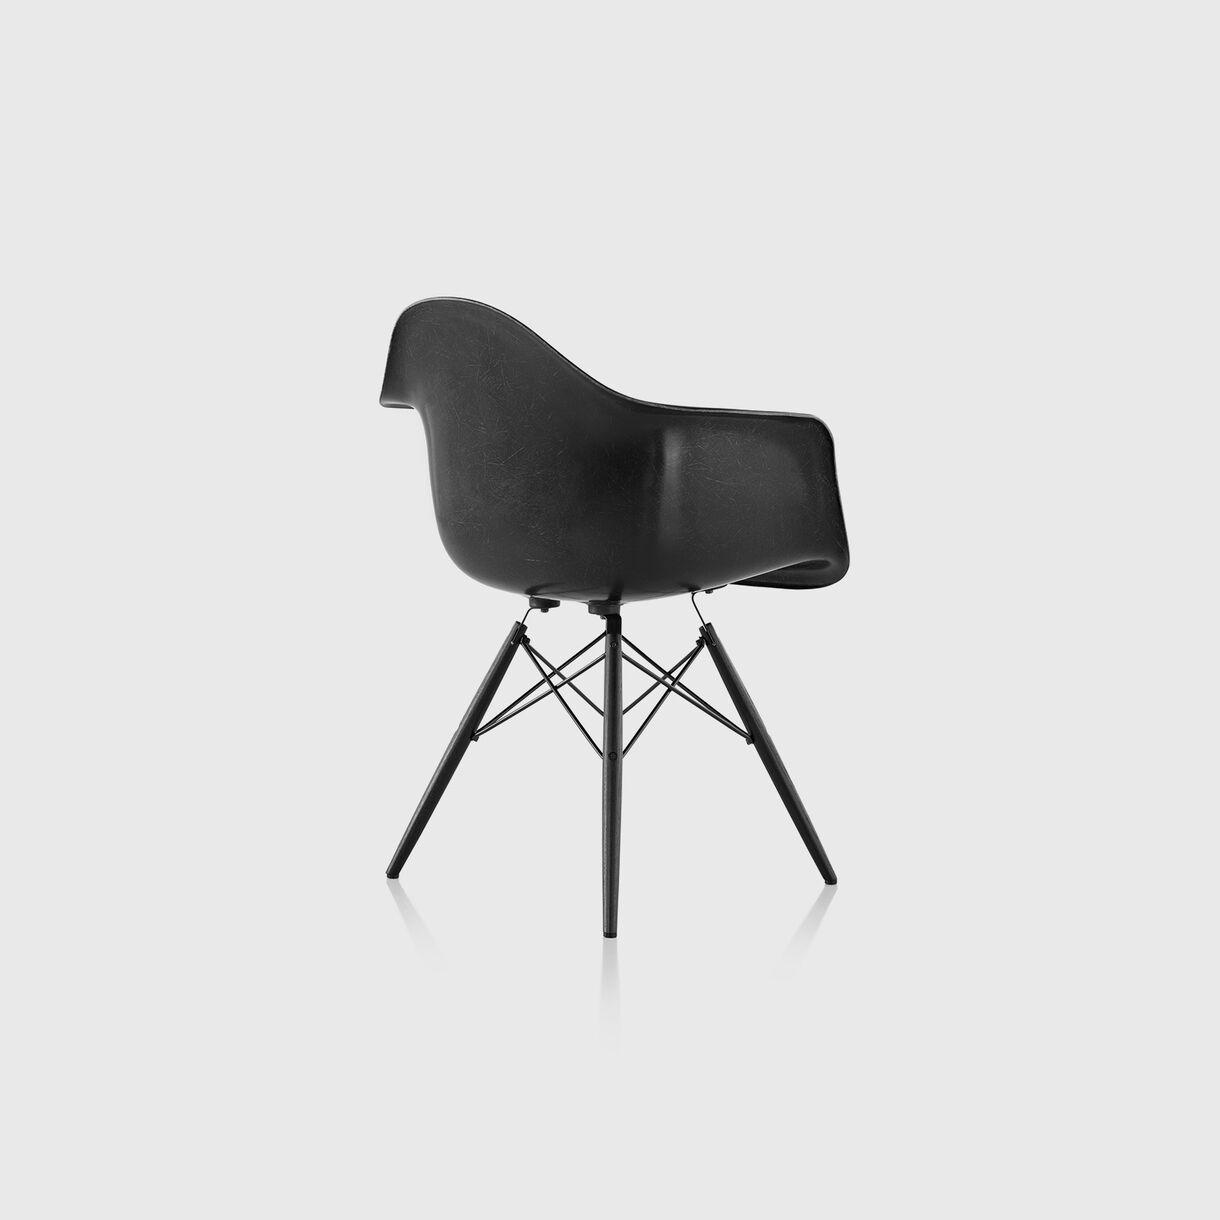 Eames Moulded Fibreglass Armchair, Dowel Base, Black & Ebony